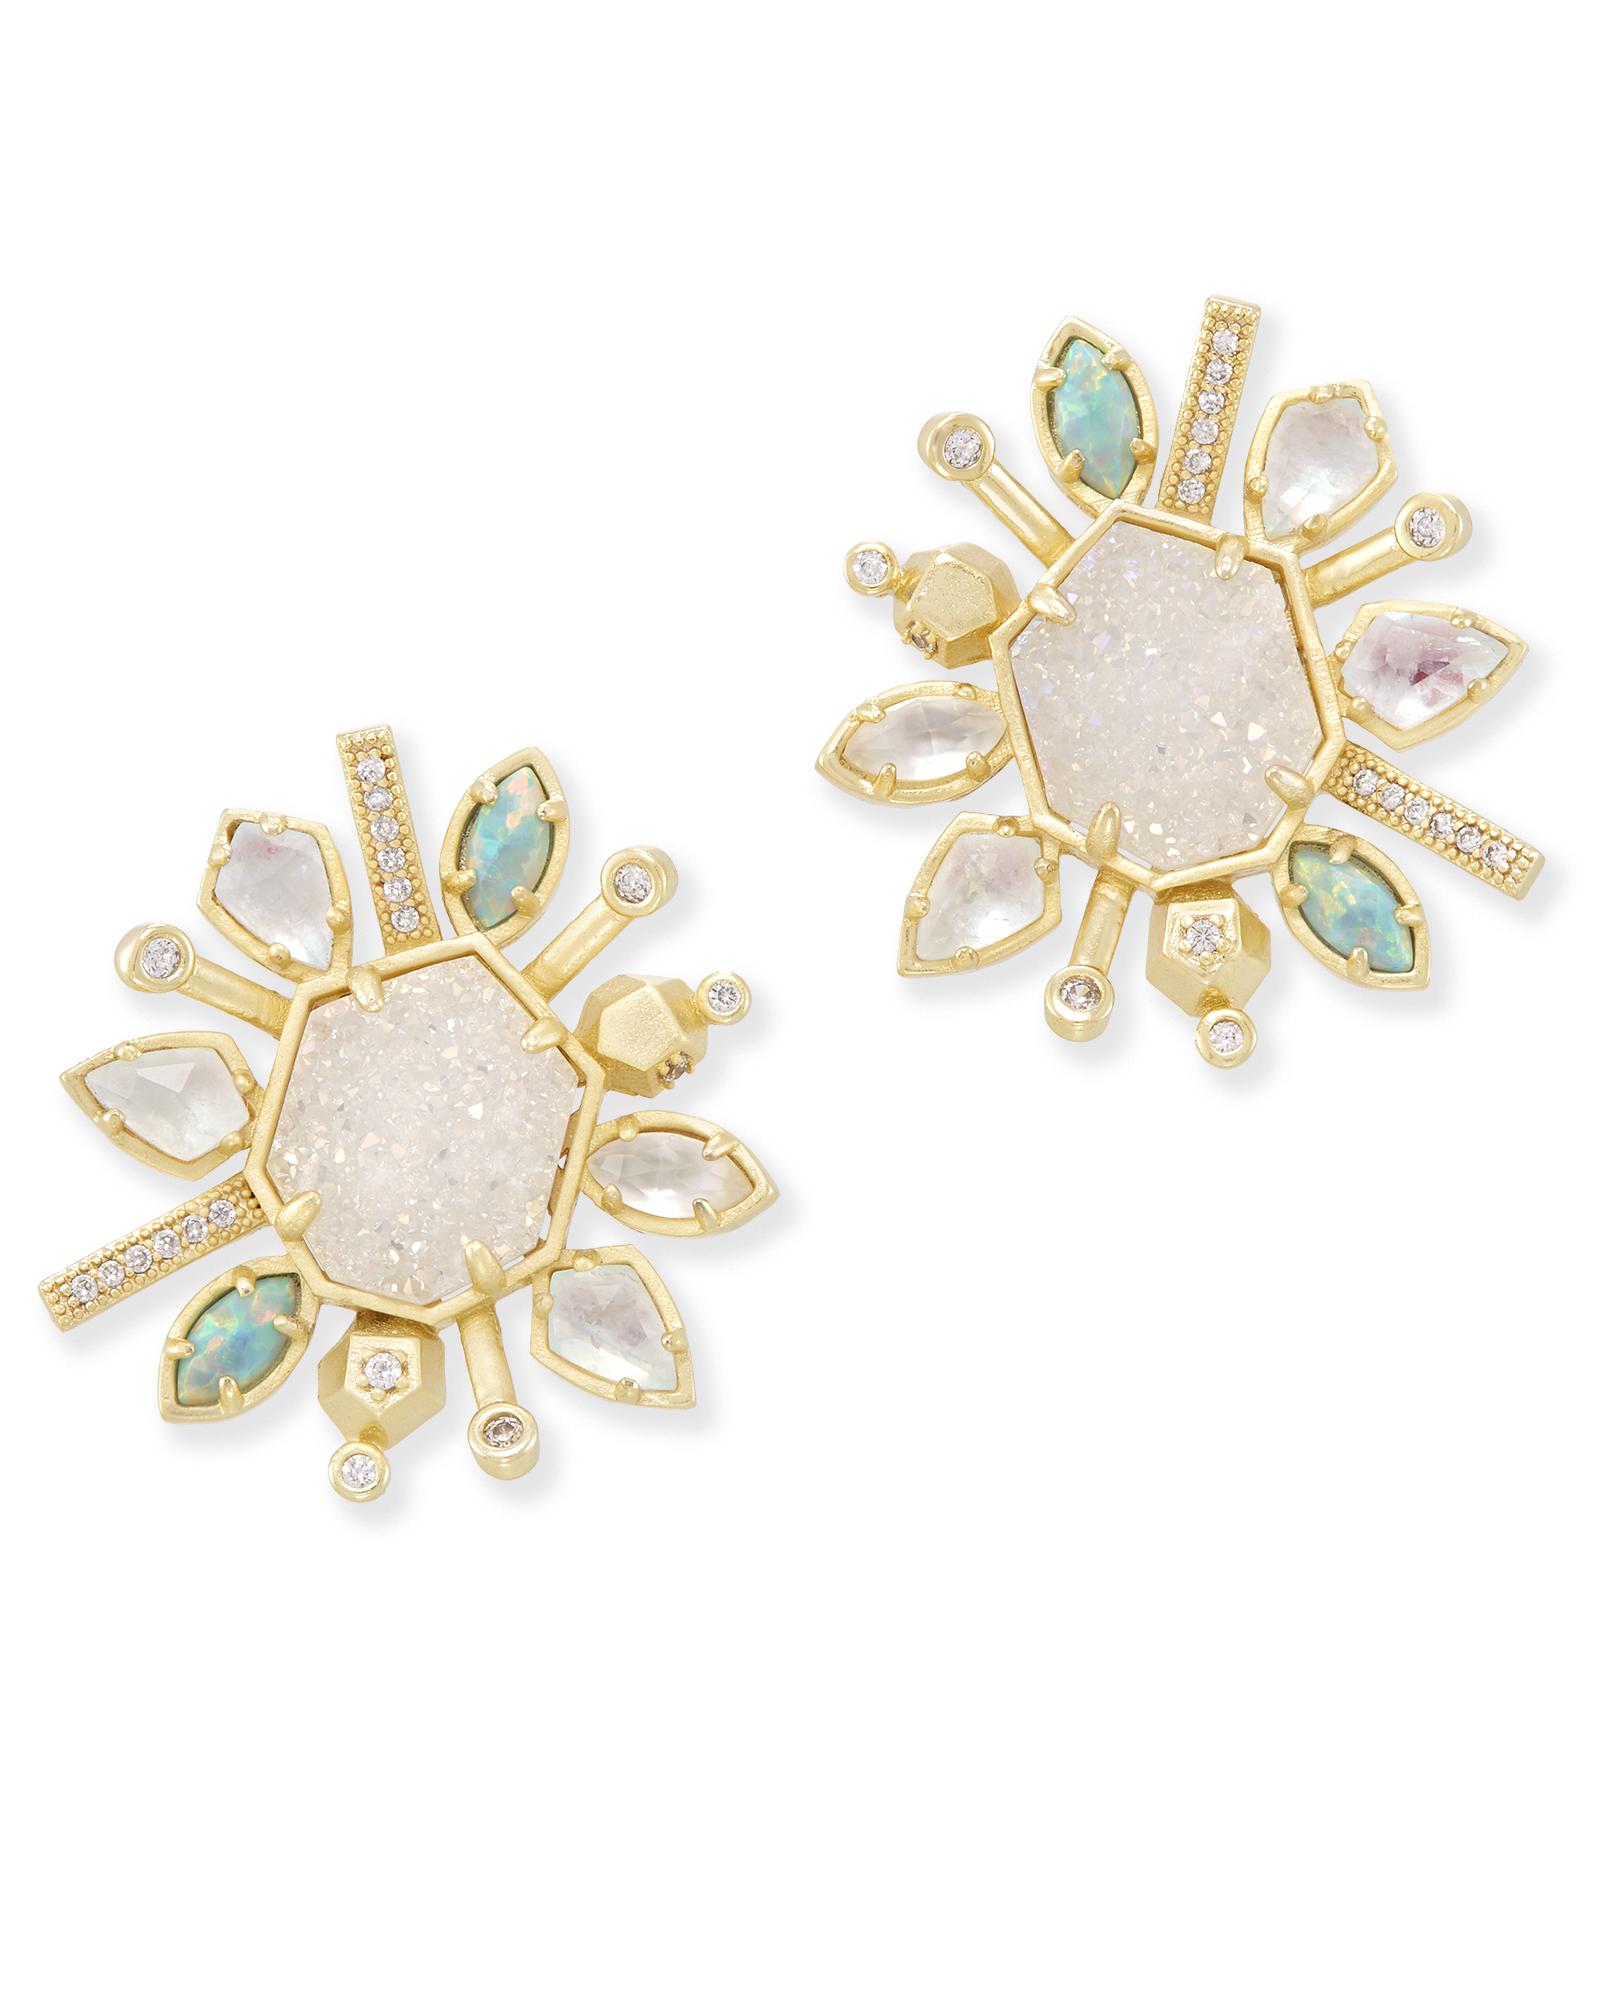 Ophelia Stud Earrings In Haven